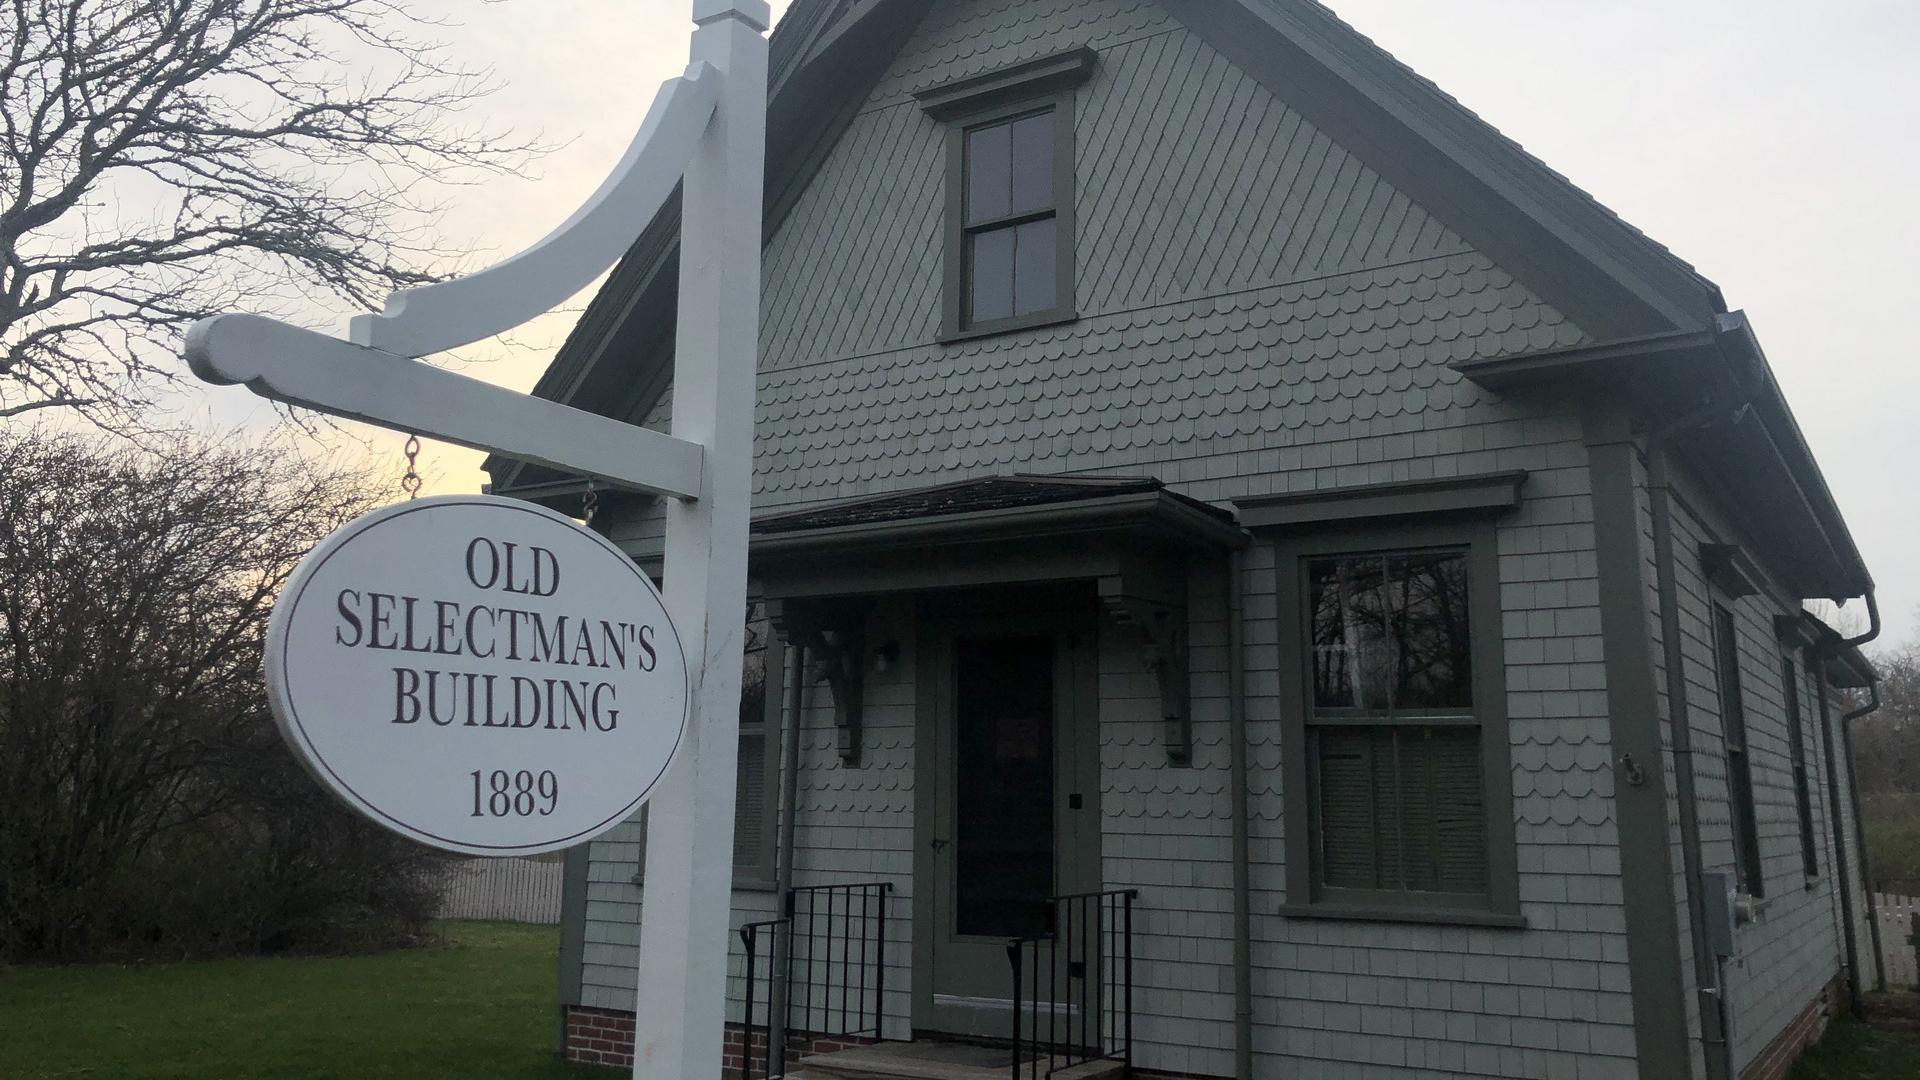 Old Selectman's Building